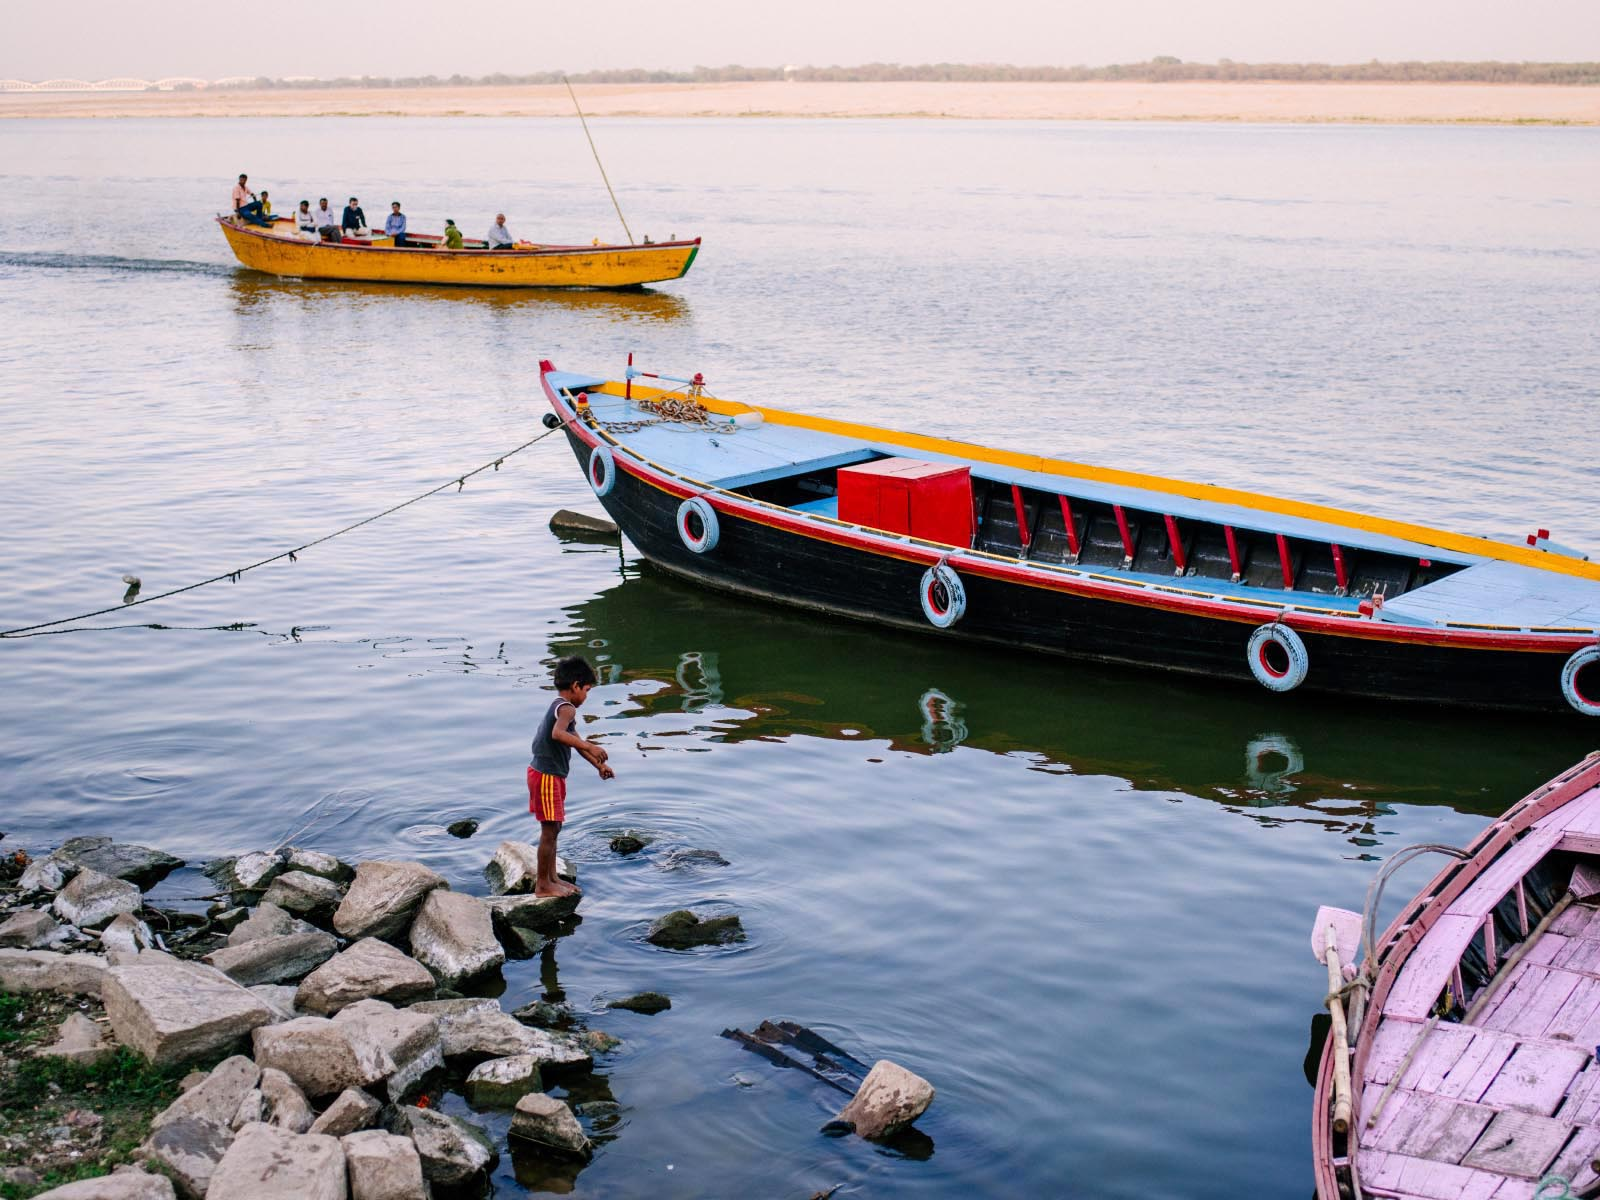 india-travel-photography-01.jpg